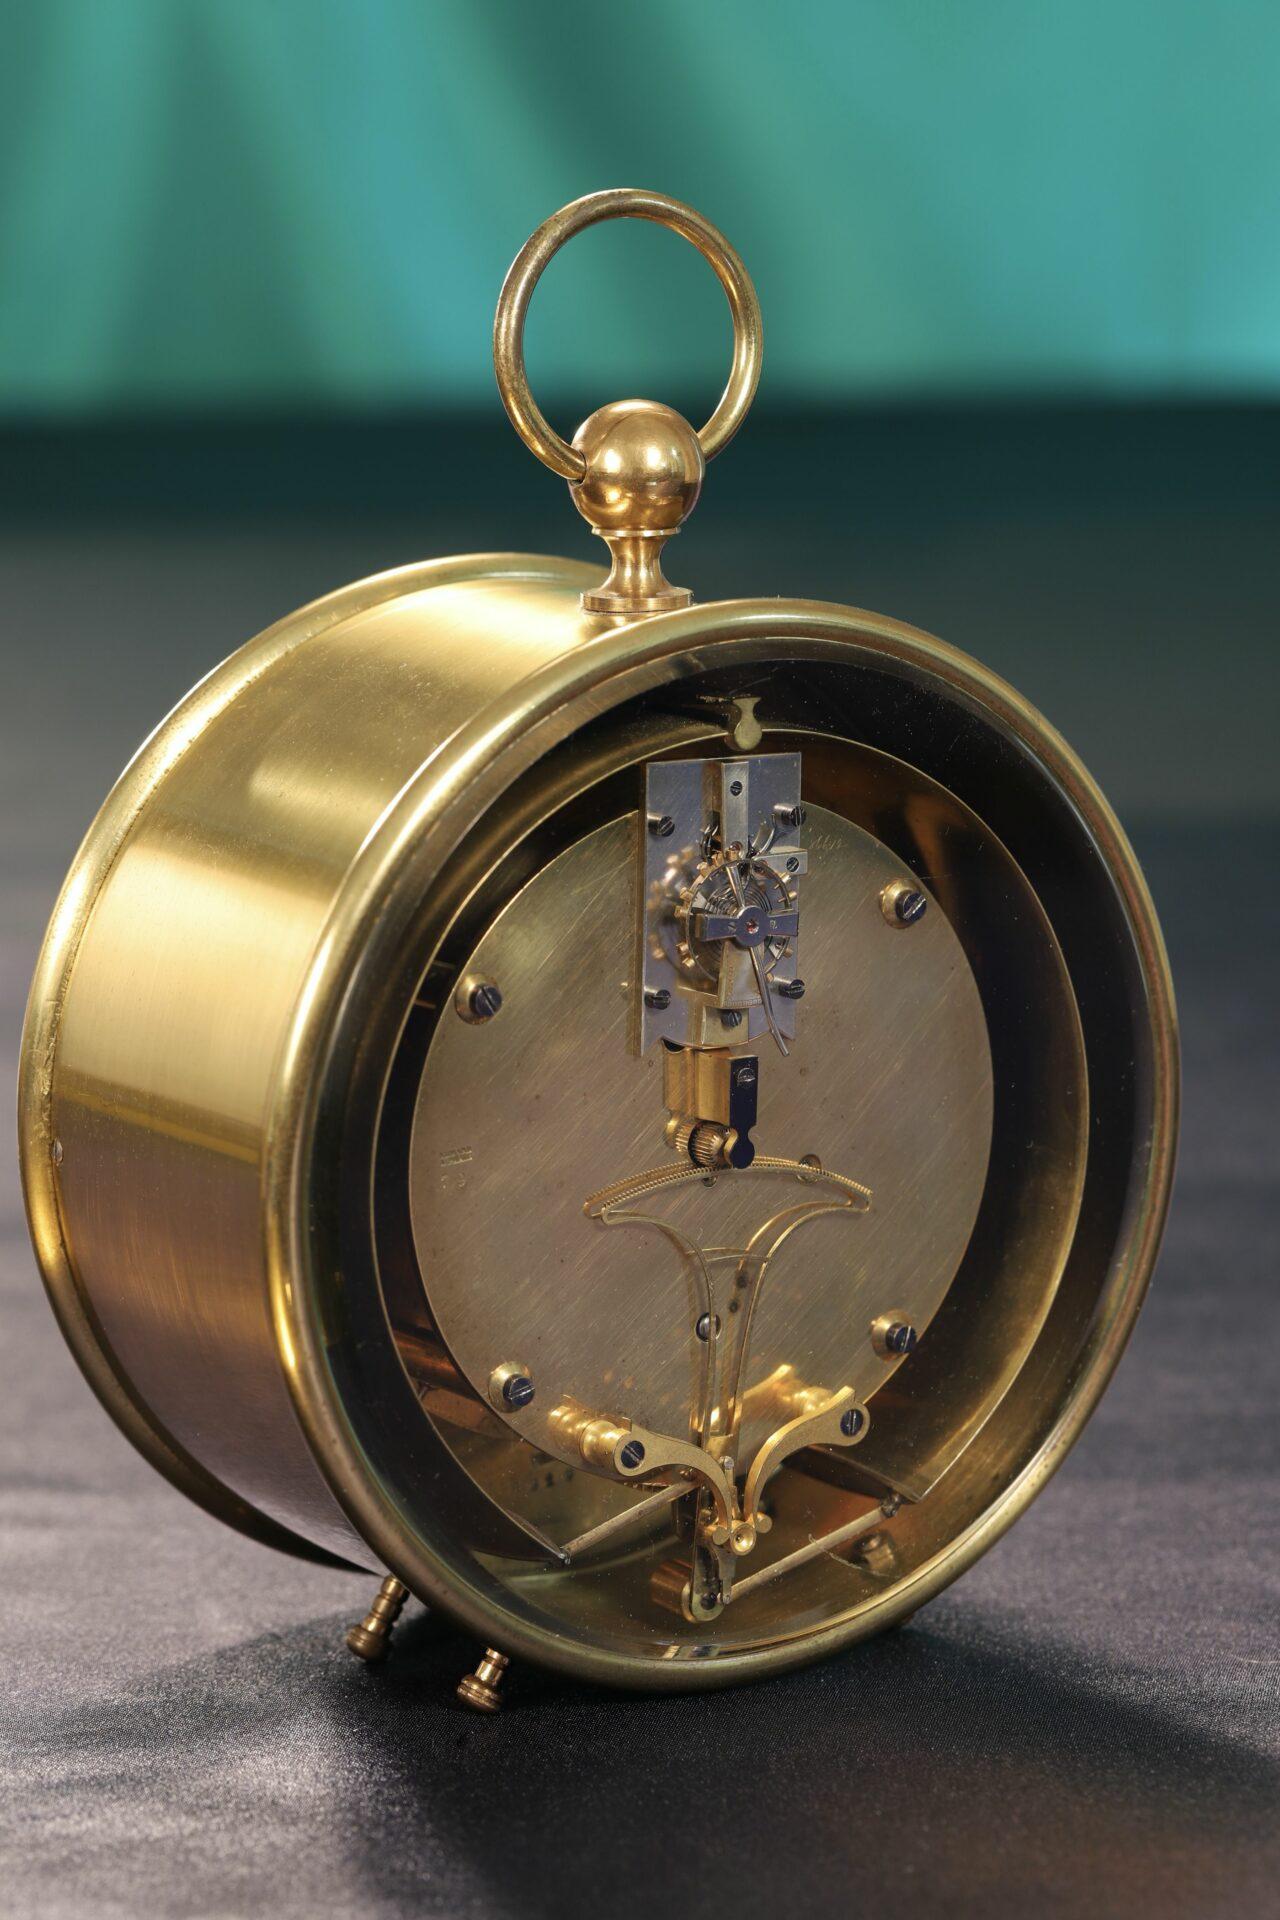 Rear view of Bourdon & Richard Barometer Clock No 79 c1880 taken from lefthand side